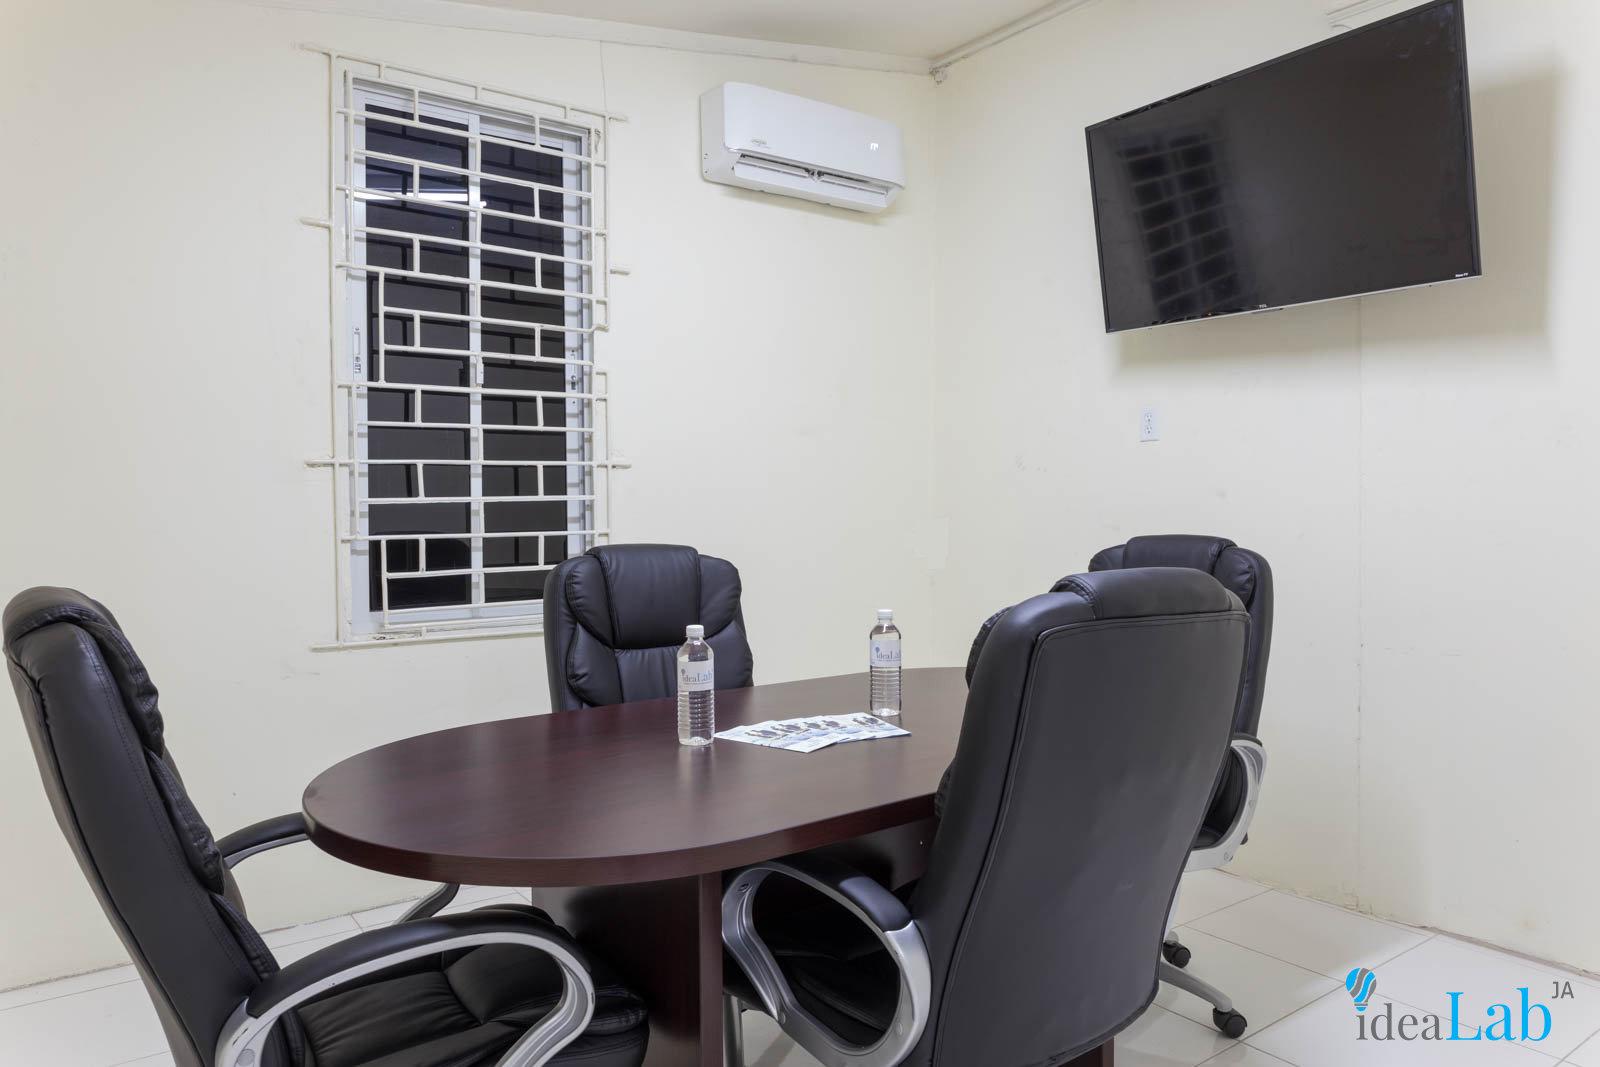 Meeting Room 1 (1 hour)